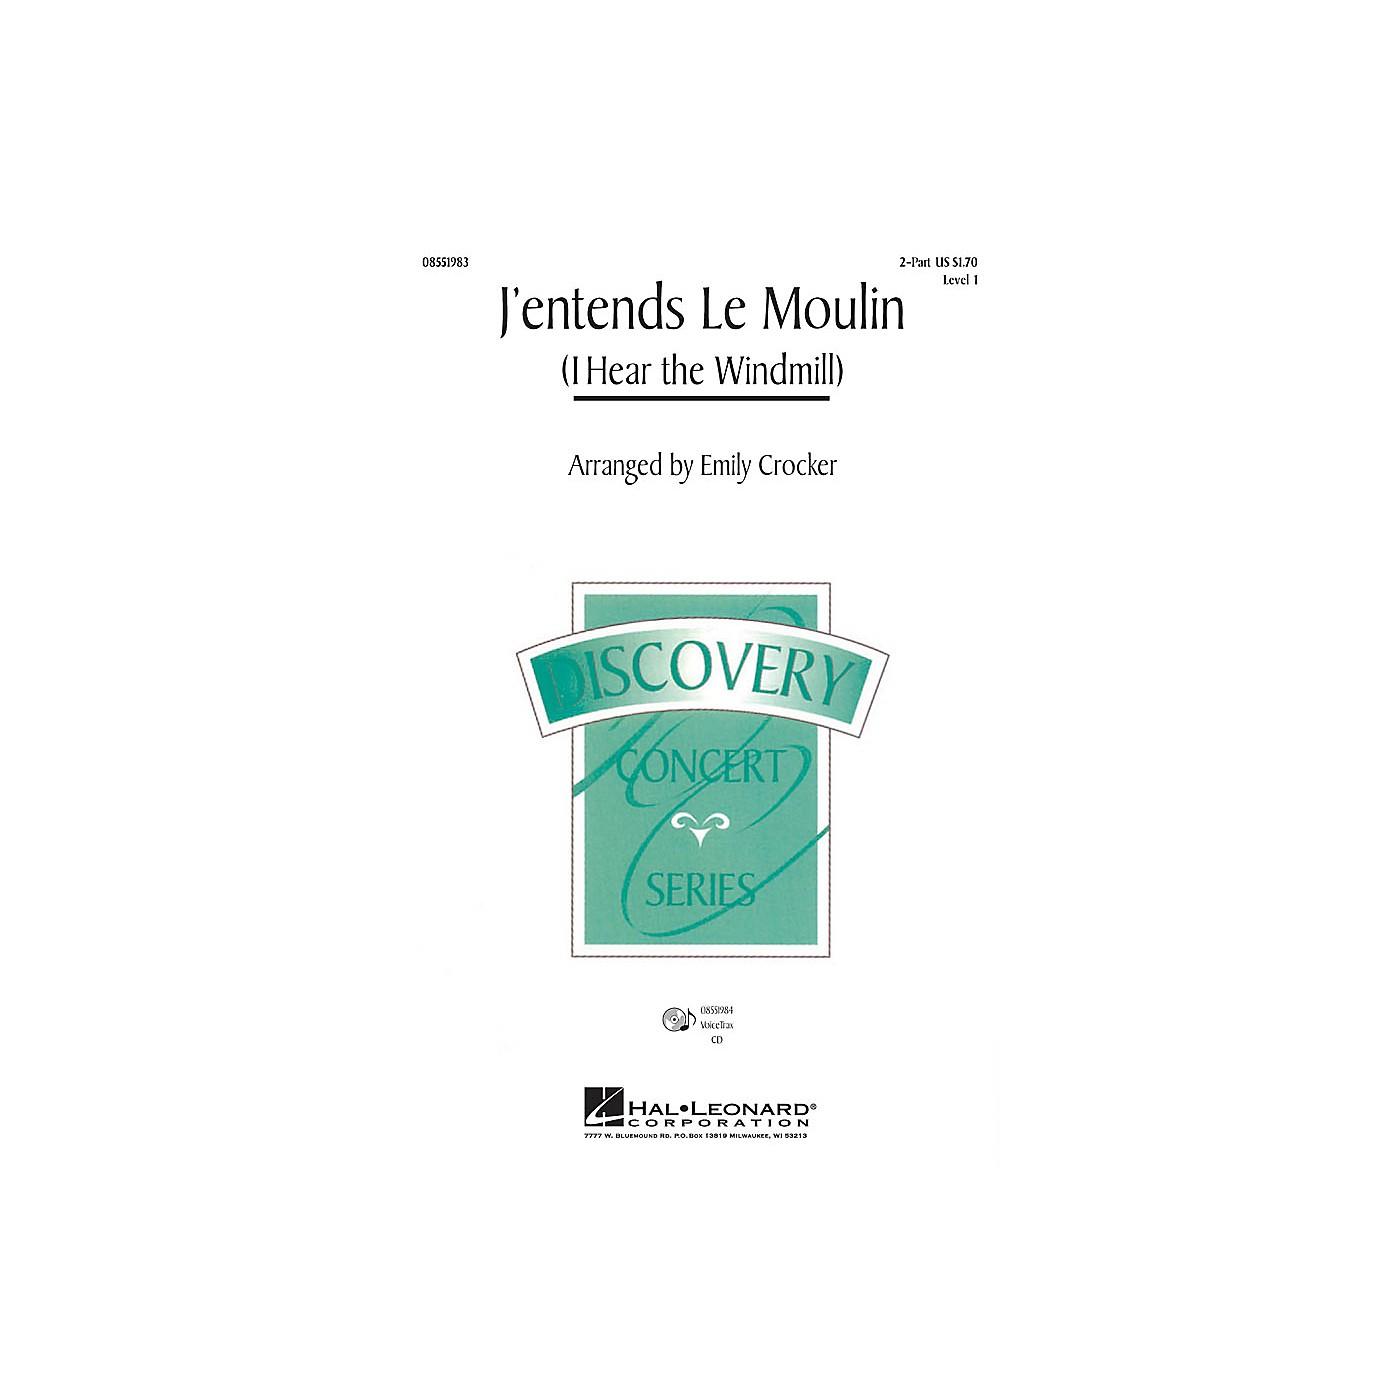 Hal Leonard J'entends le moulin (I Hear the Wind Mill) VoiceTrax CD Arranged by Emily Crocker thumbnail